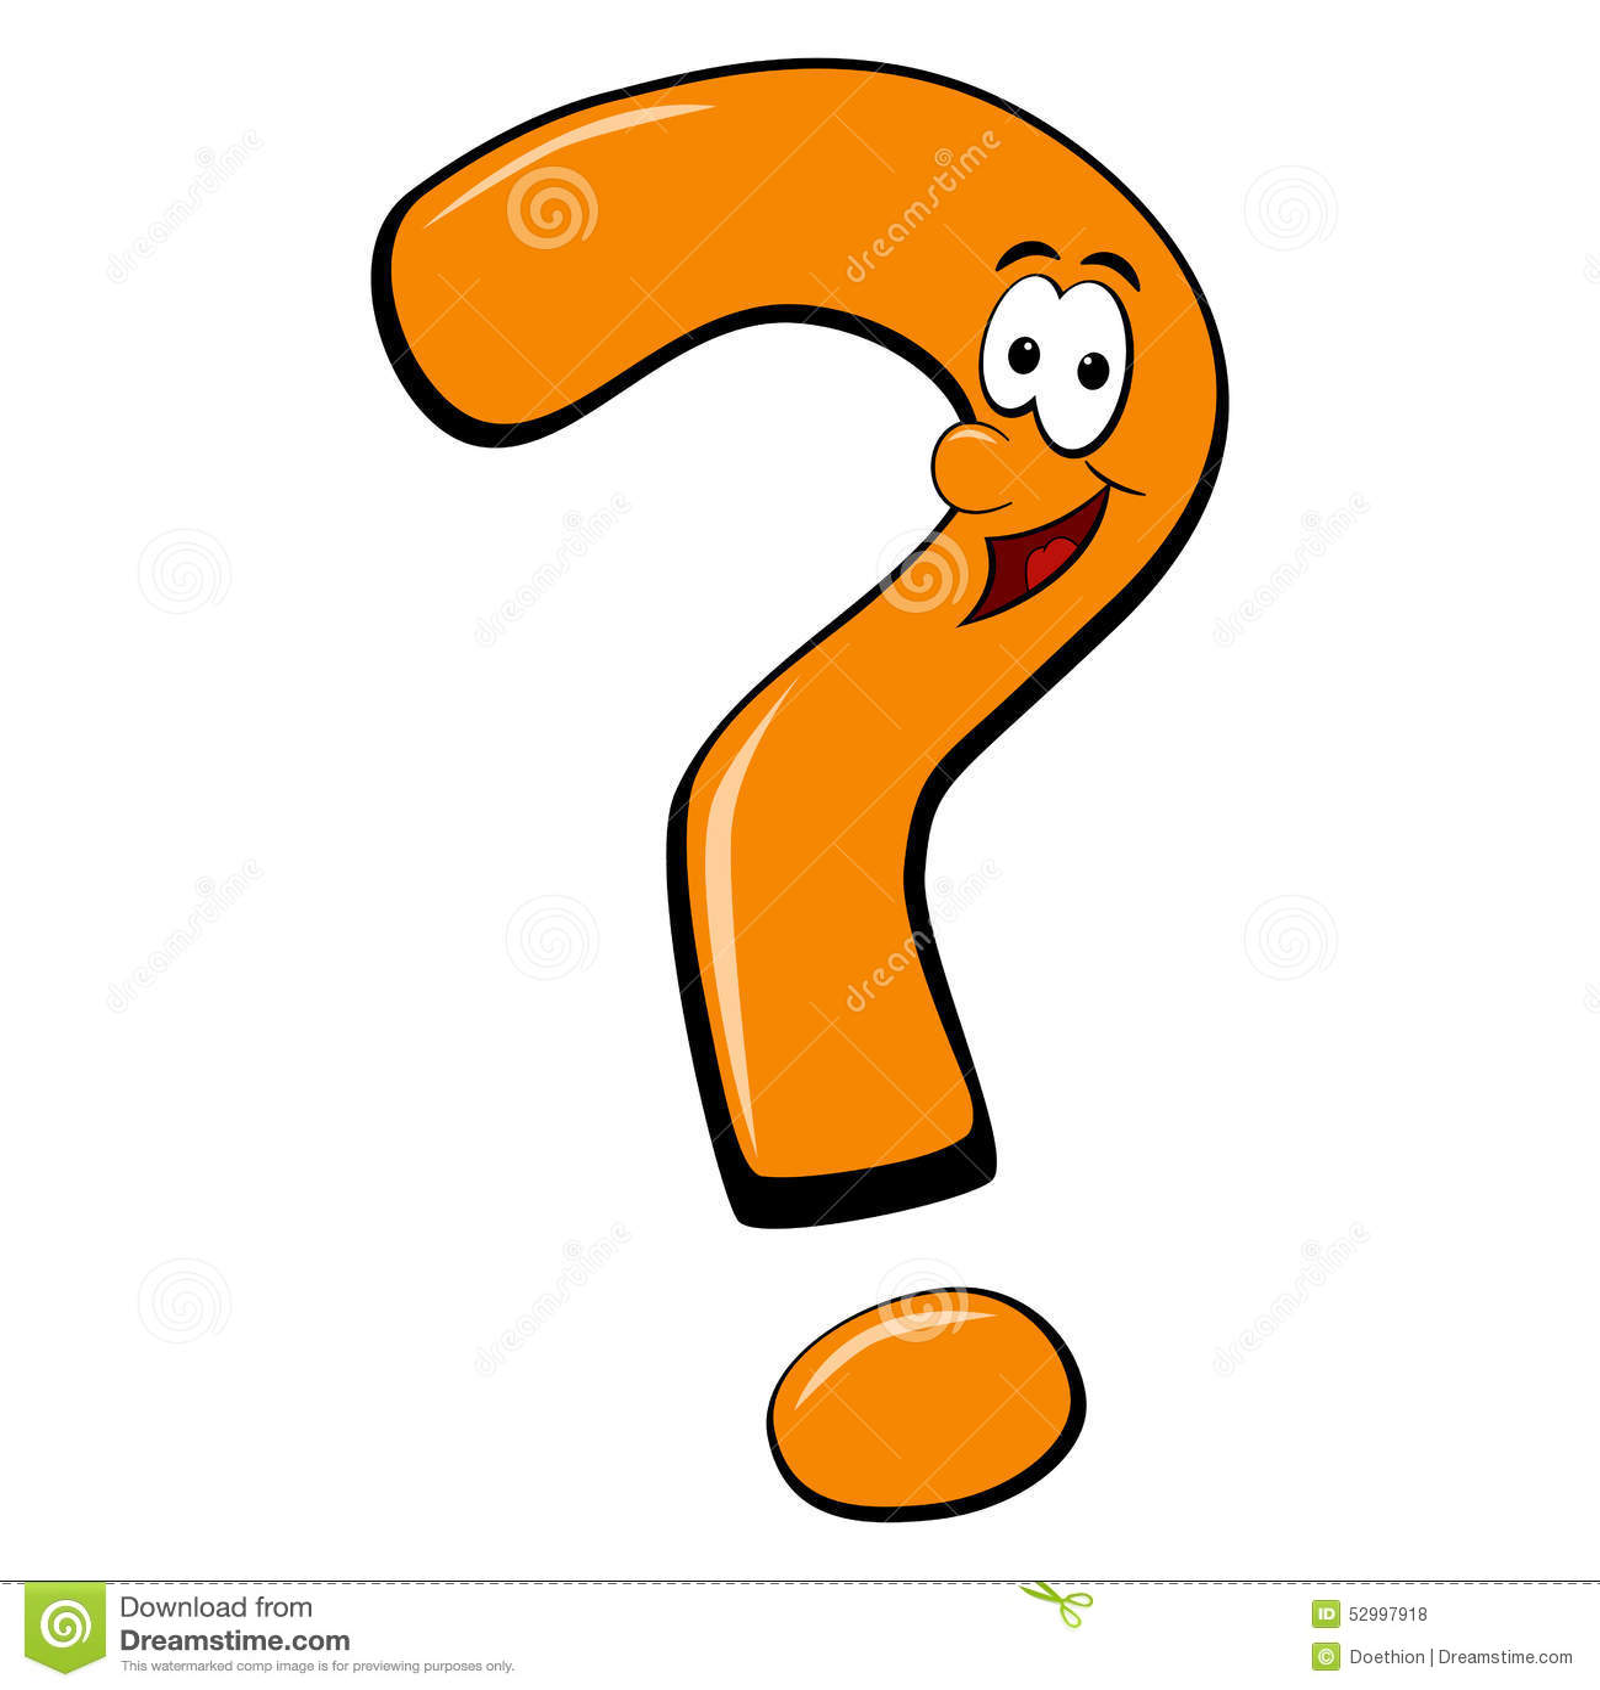 Smiling Faced Cartoon Question Mark Stock Vector Illustration Of